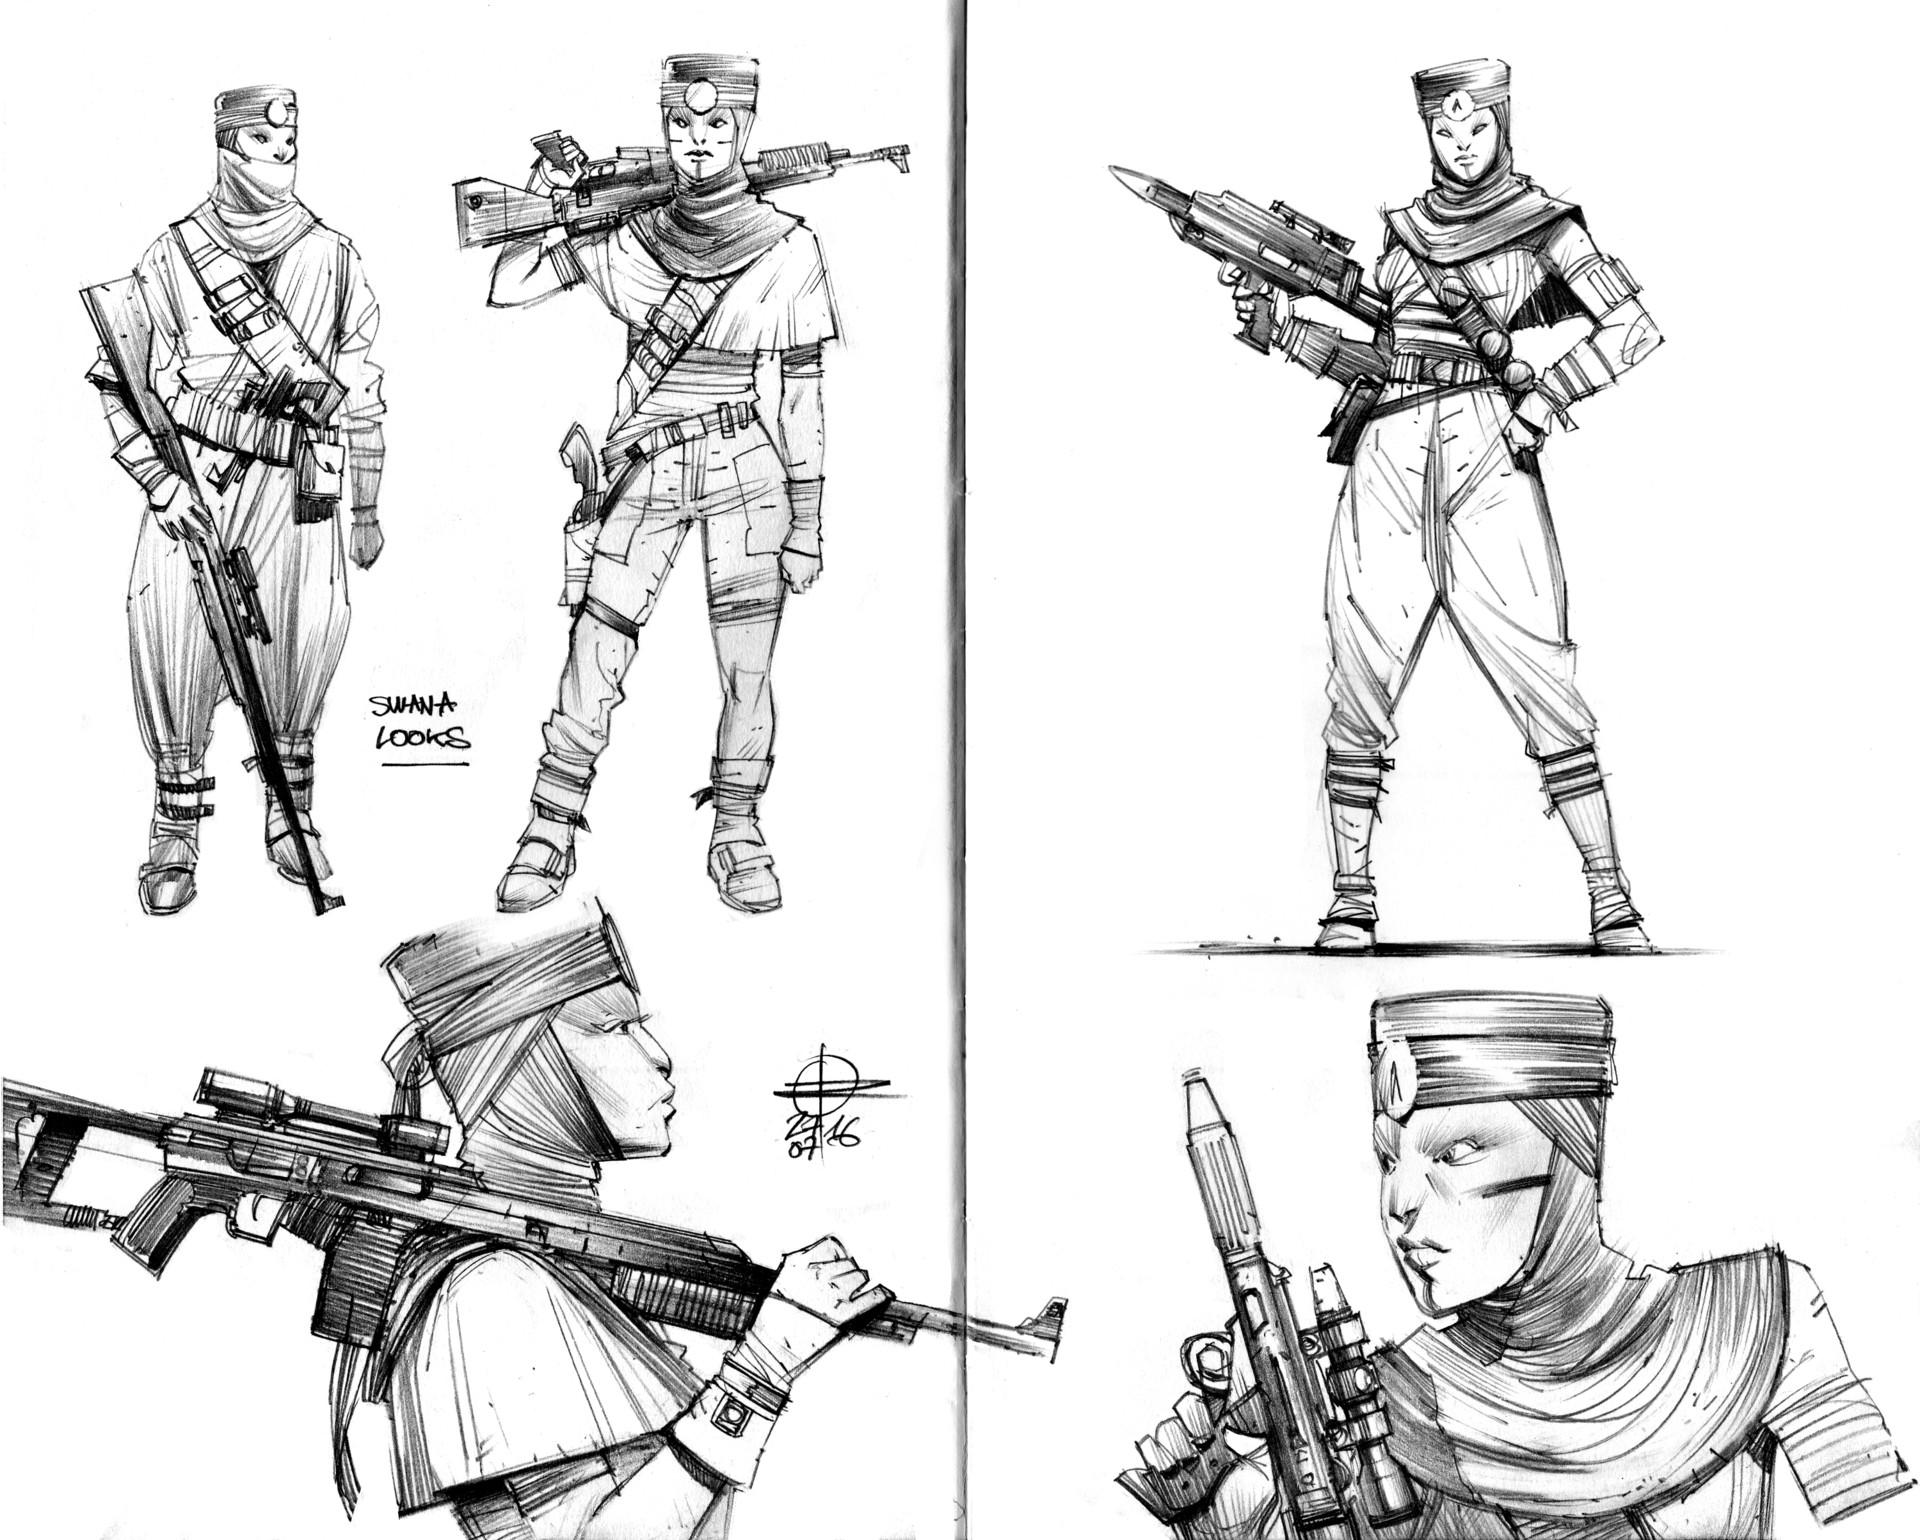 Renaud roche part05 sketches03b